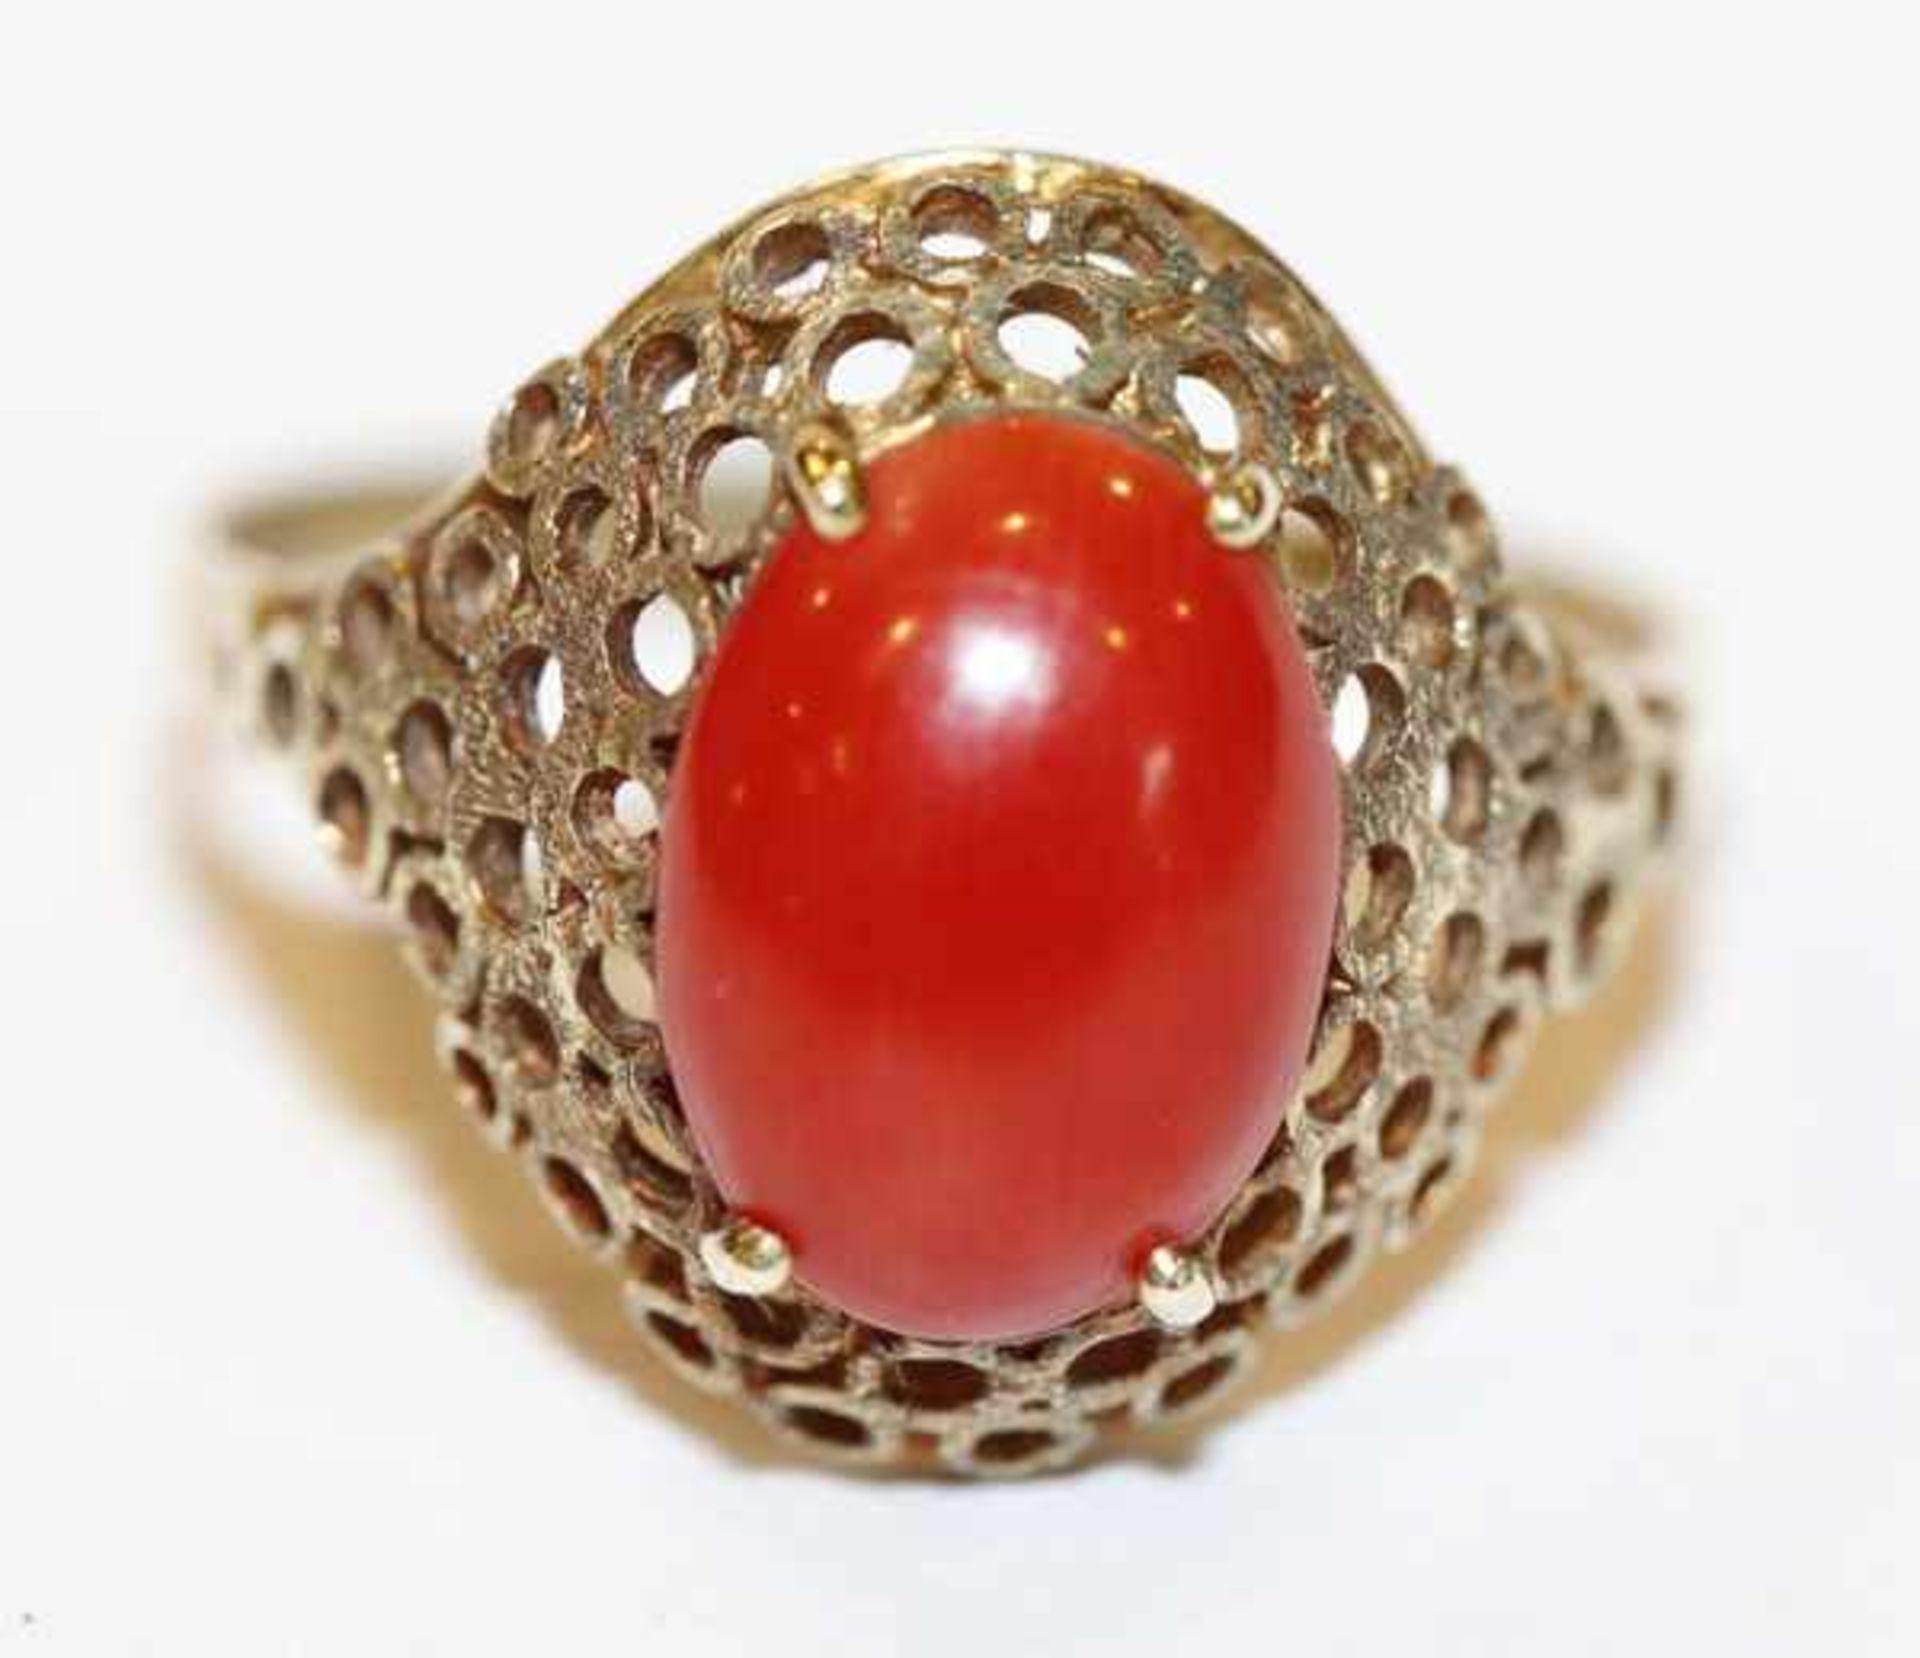 Los 31 - 14 k Gelbgold Ring mit Koralle, 3,2 gr., Gr. 58